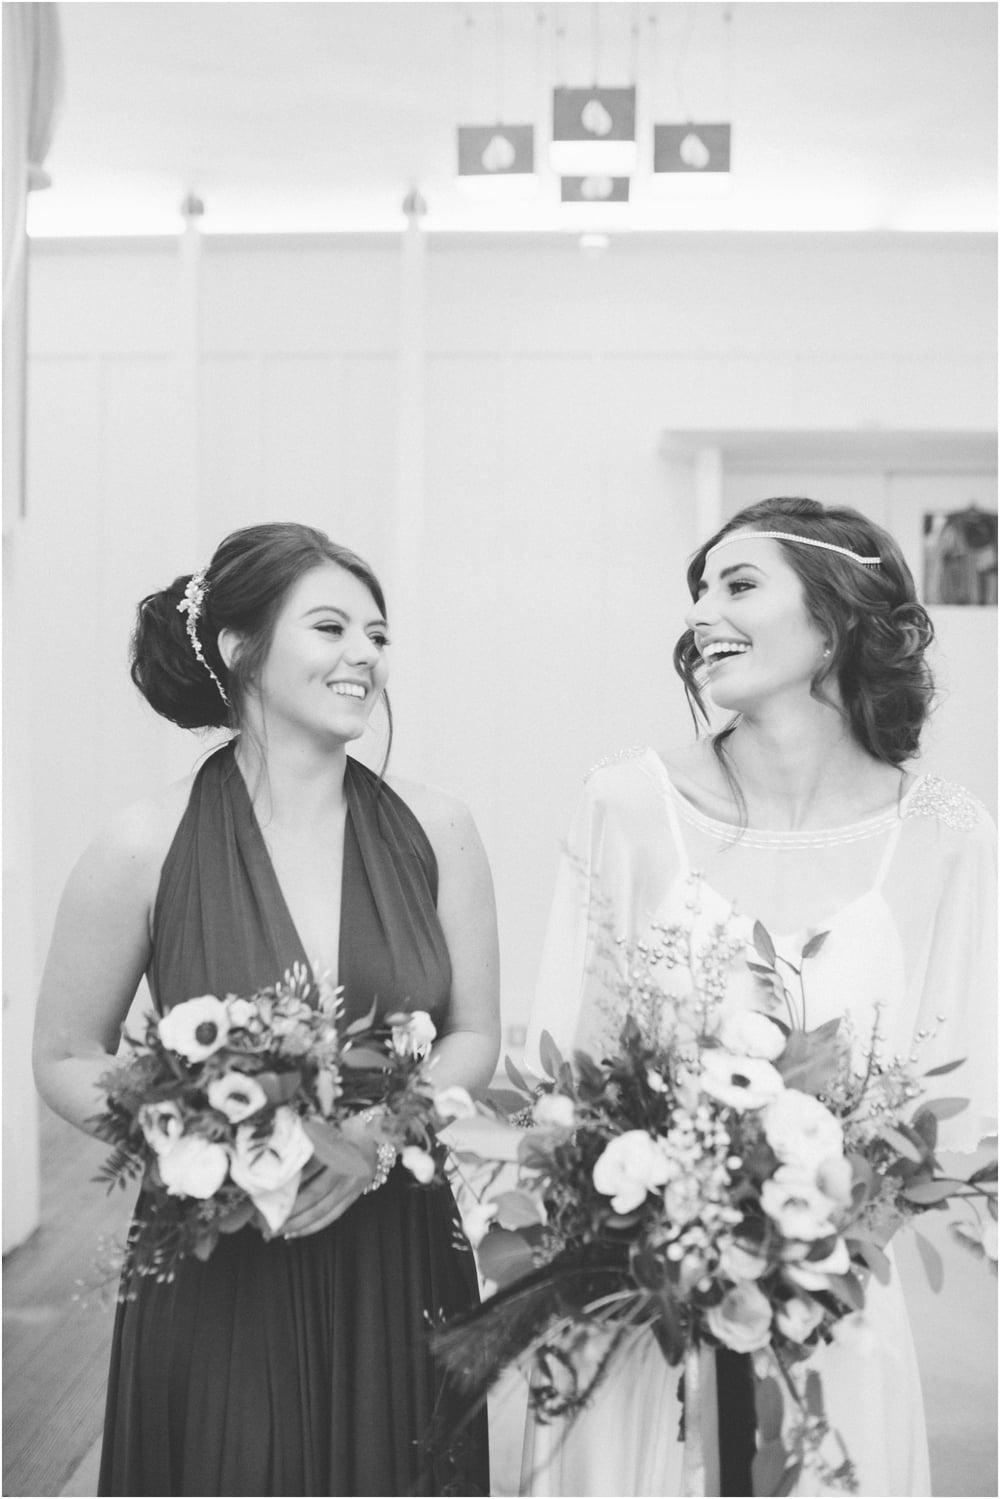 suzanne_li_photography_scotland_wedding_0027.jpg